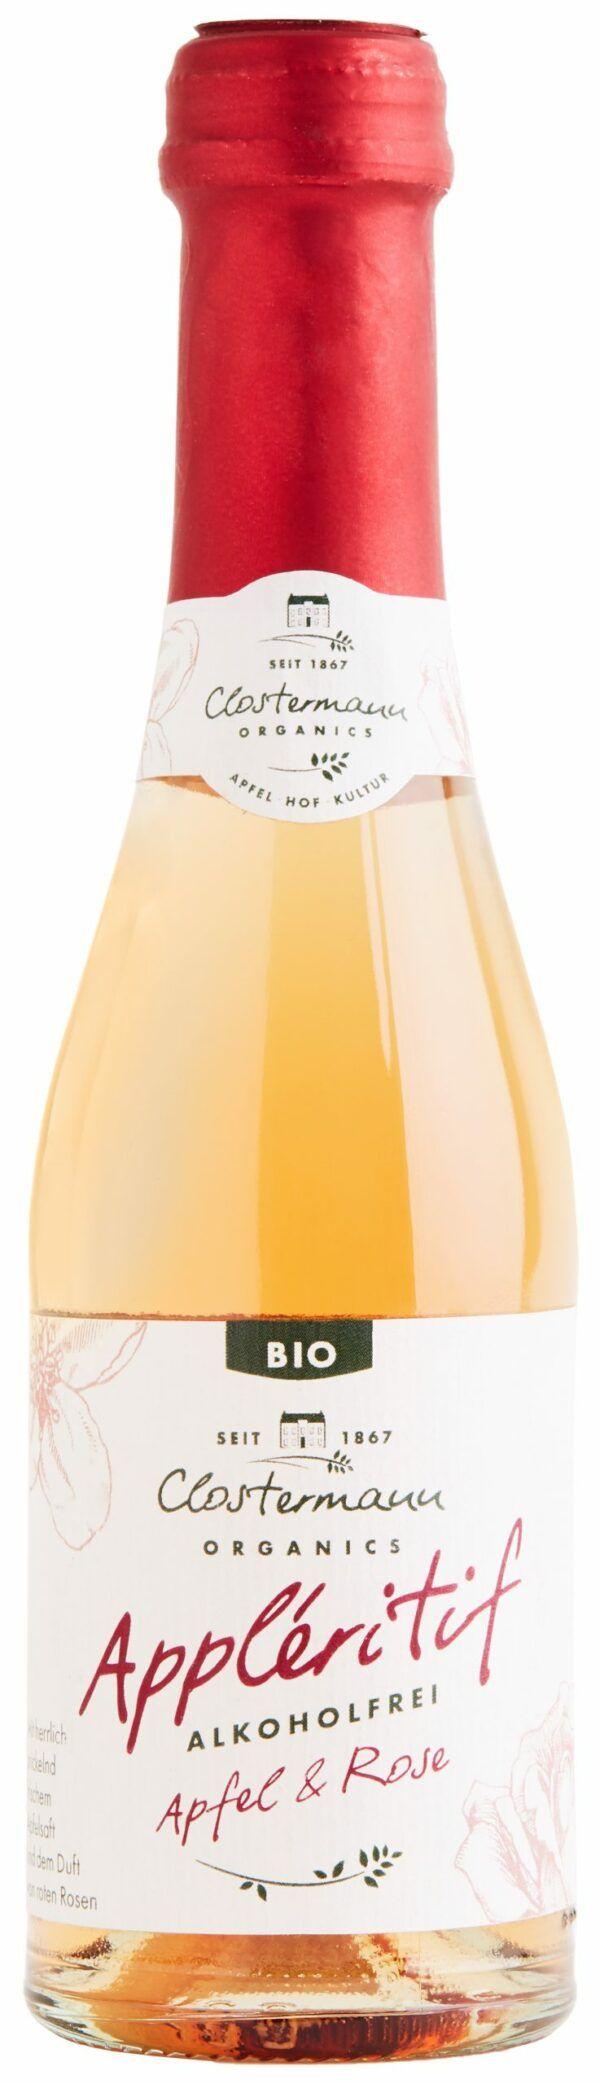 Clostermann Appleritif Apfel & Rose Piccolo (alkoholfrei) 0,2l